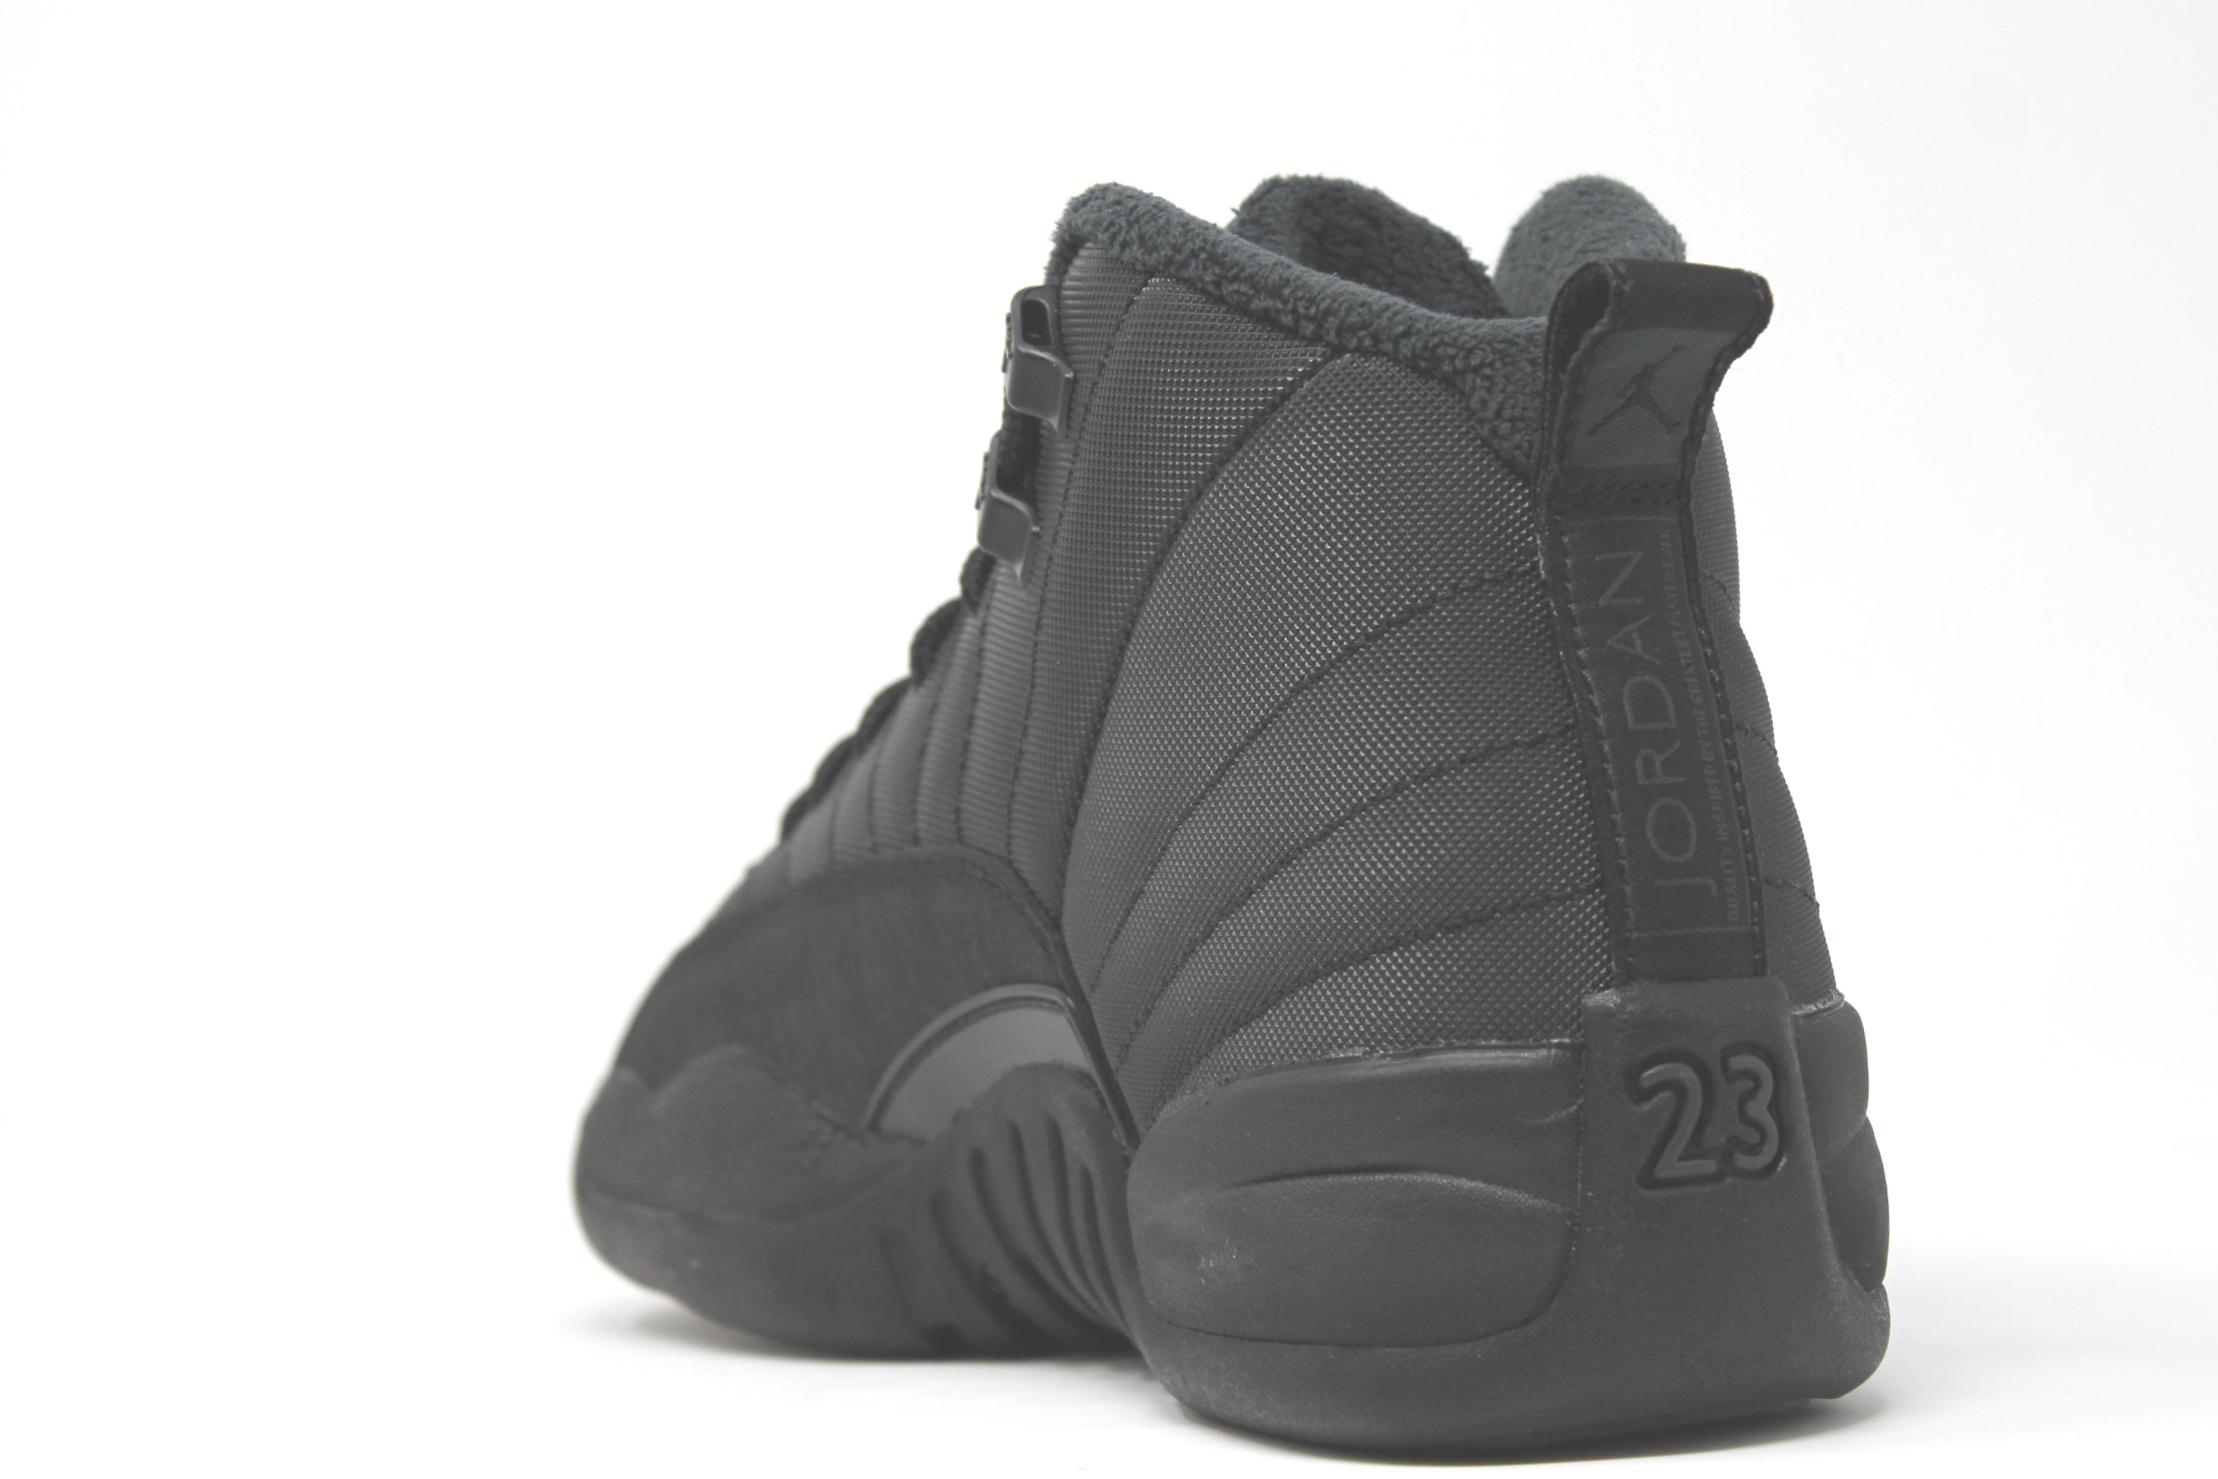 Jordan 12 Retro GS Winter Black — RAMPANT SOCIETY e4369d050